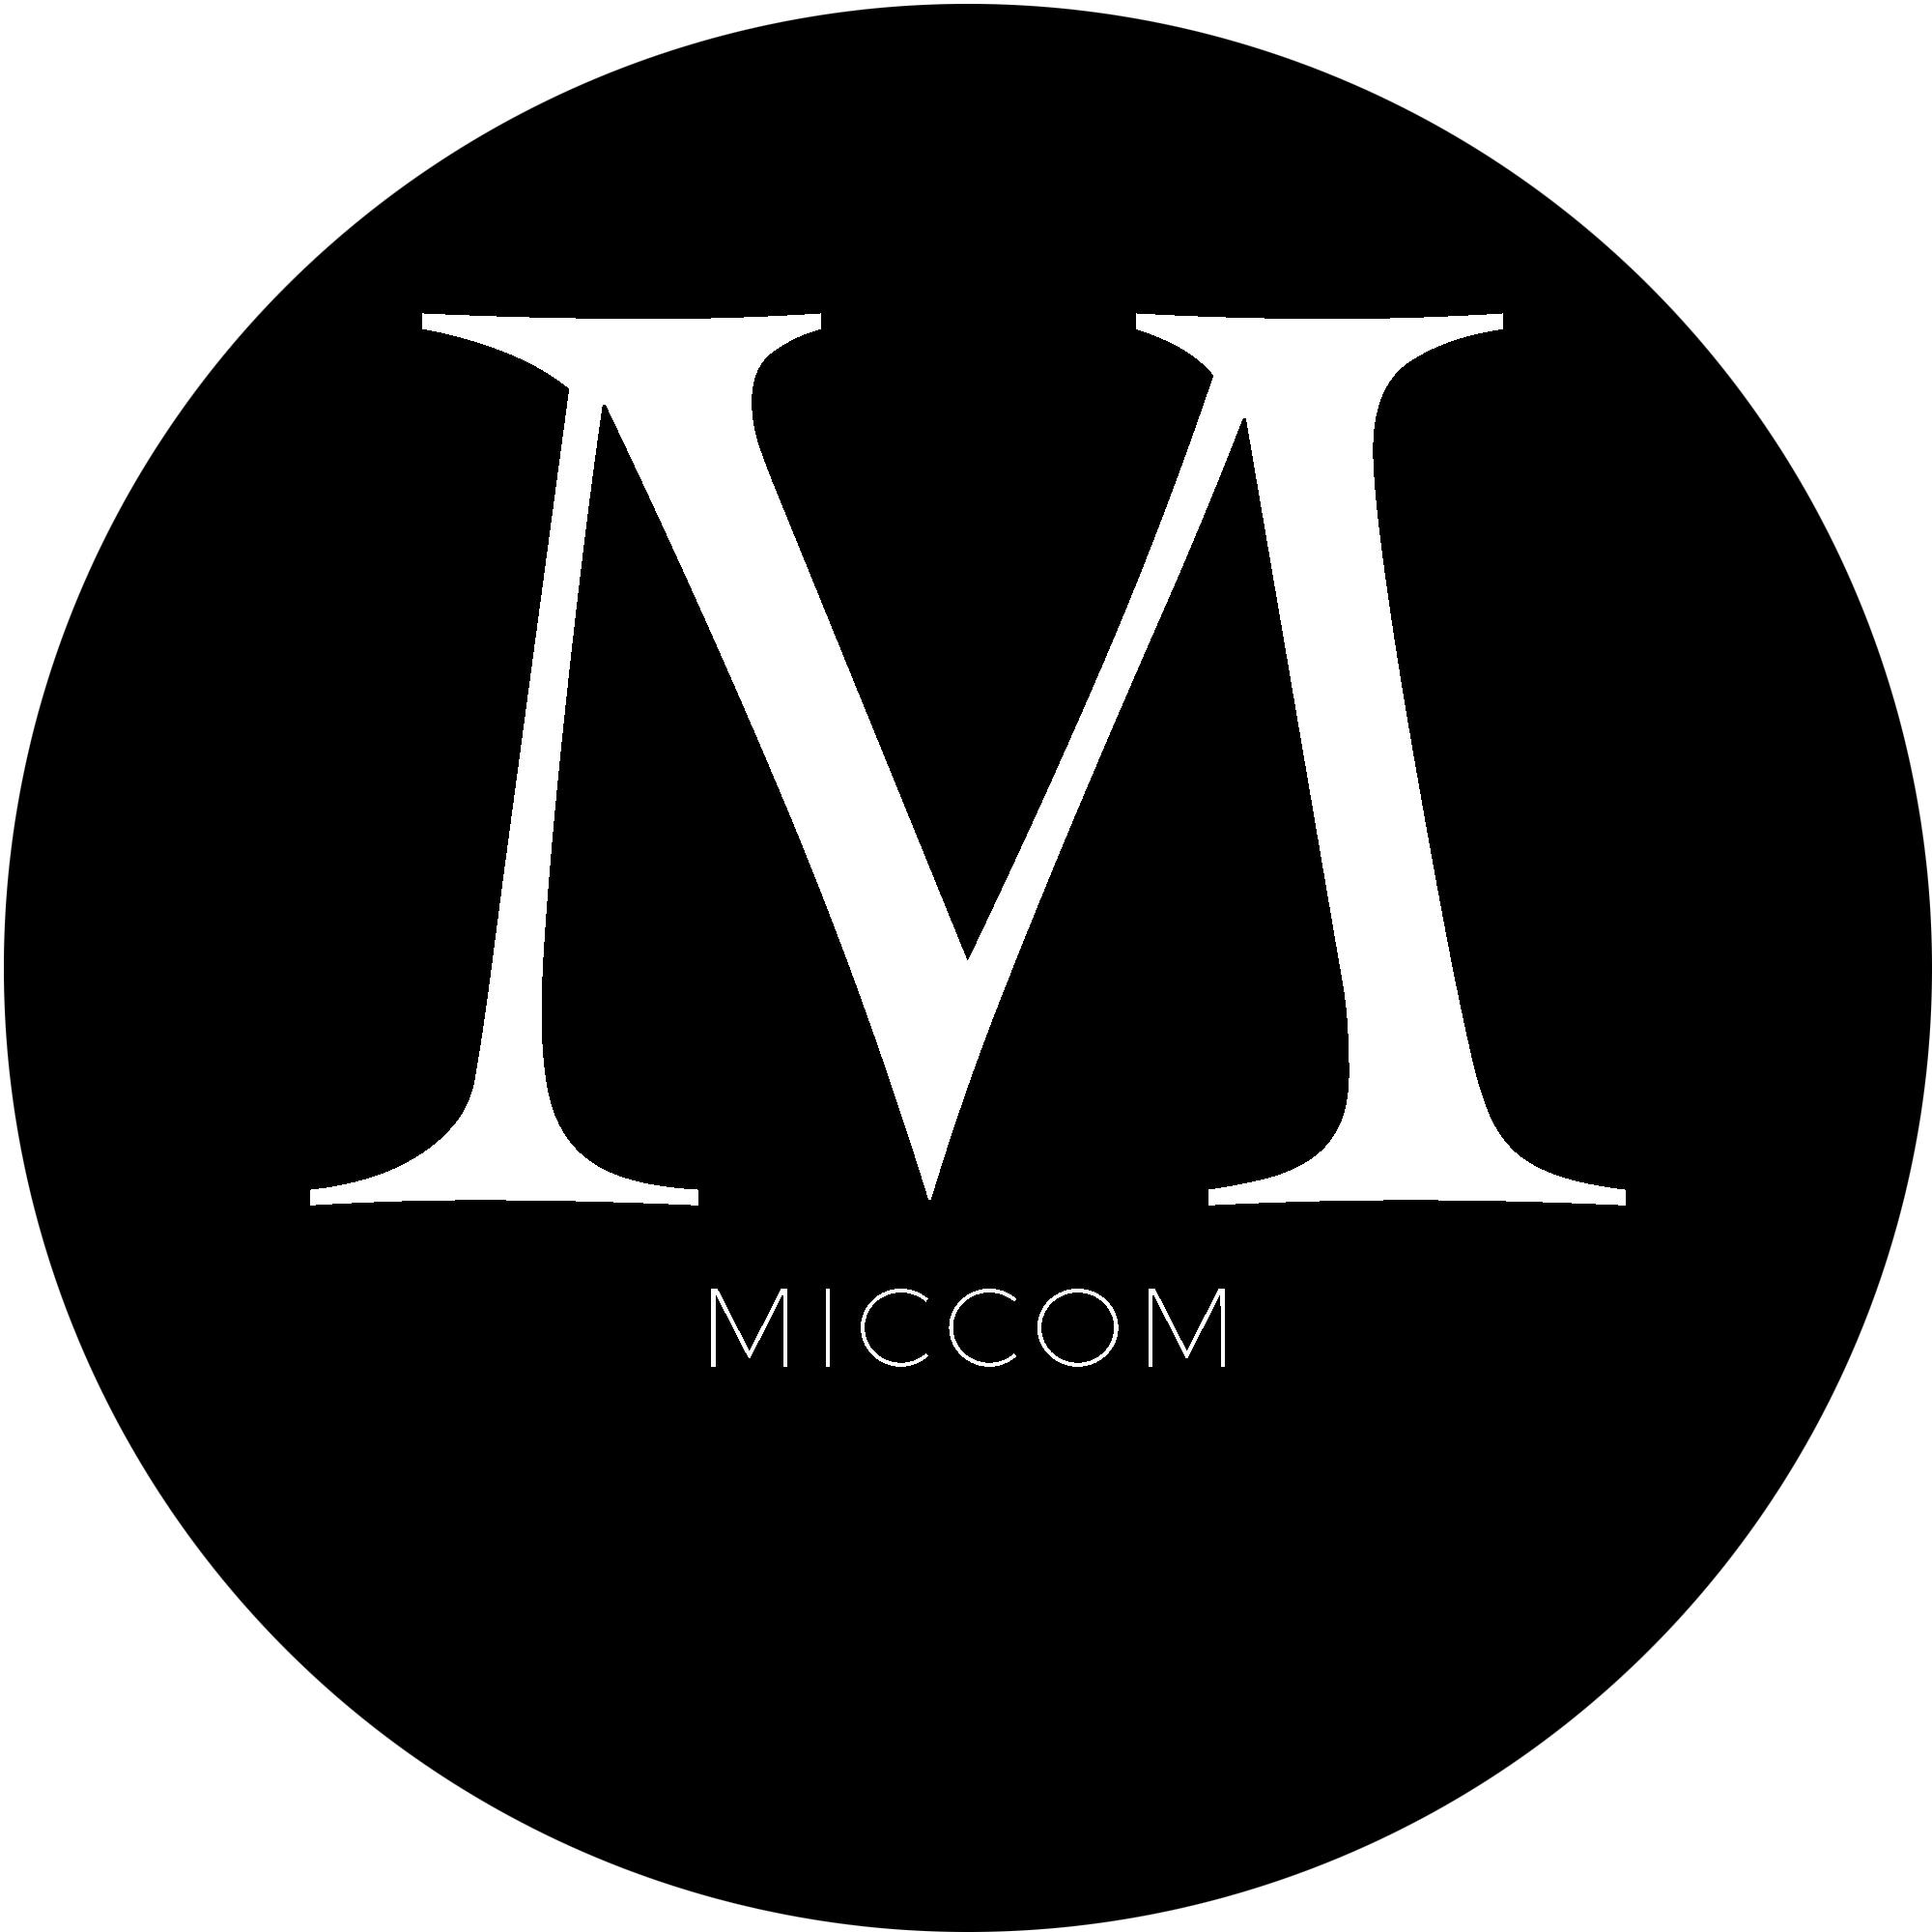 logo-miccom-black.png